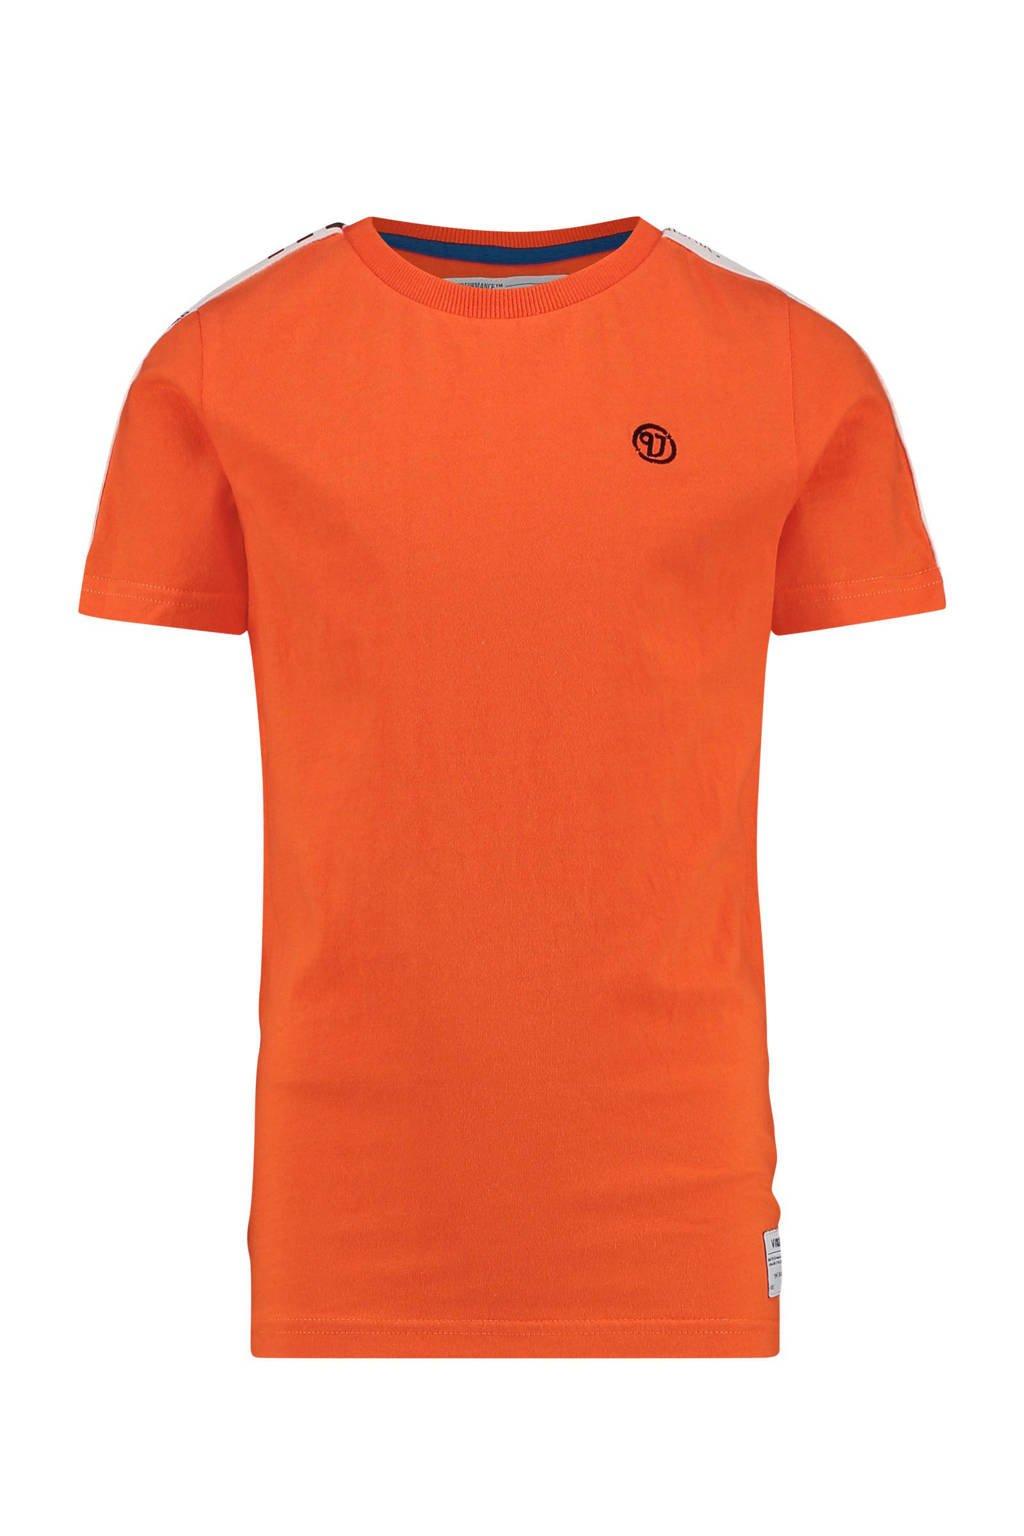 Vingino T-shirt Herlief met contrastbies oranje, Oranje